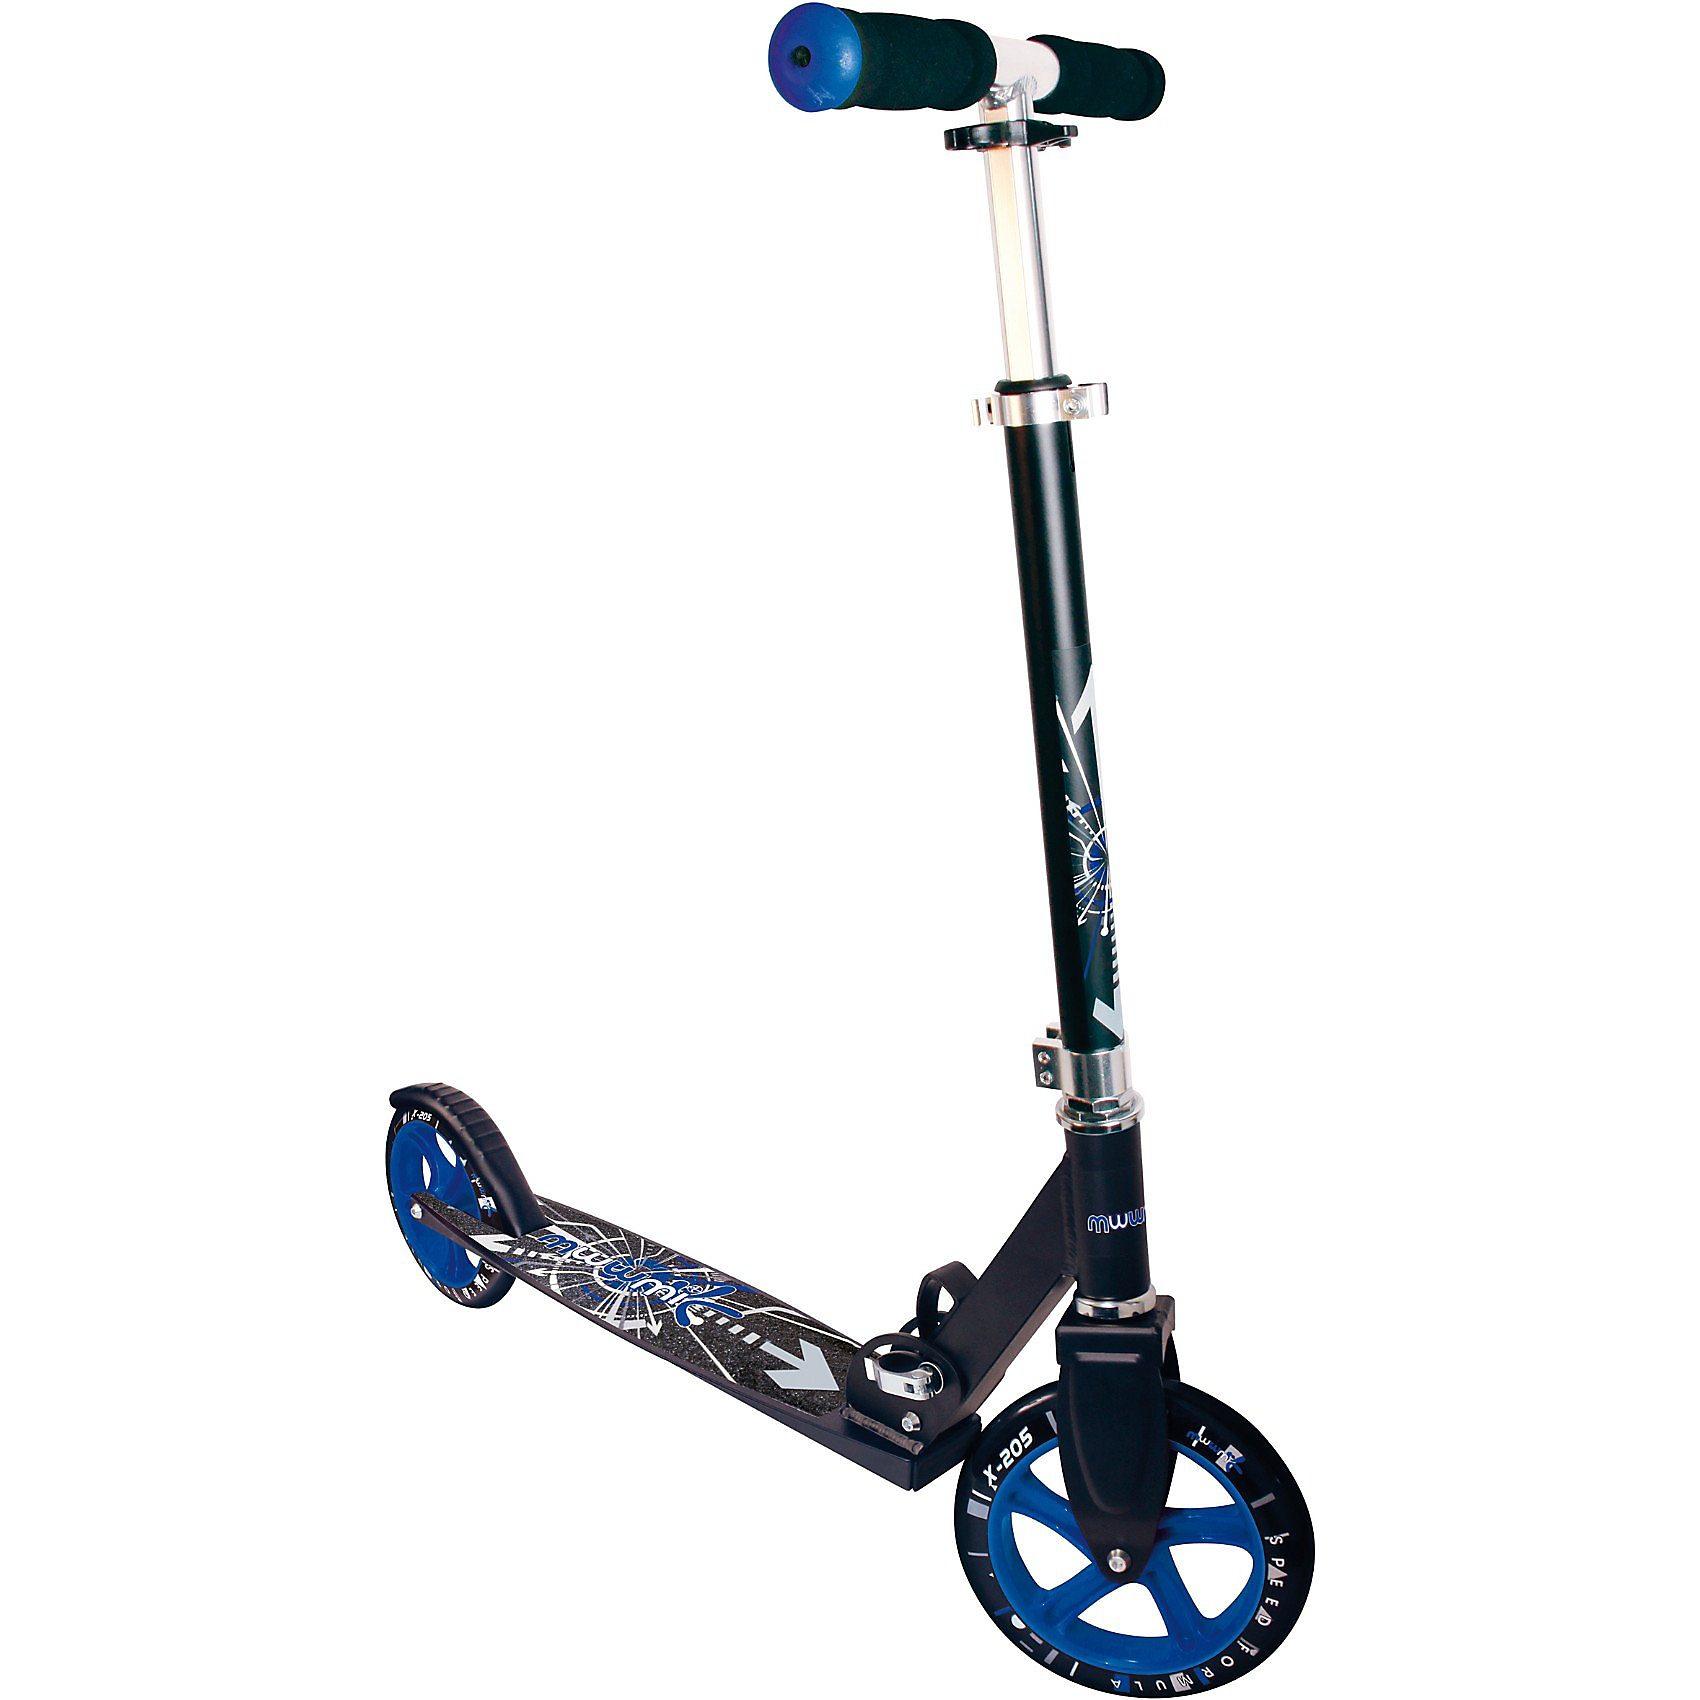 Muuwmi Scooter schwarz/blau 205 mm